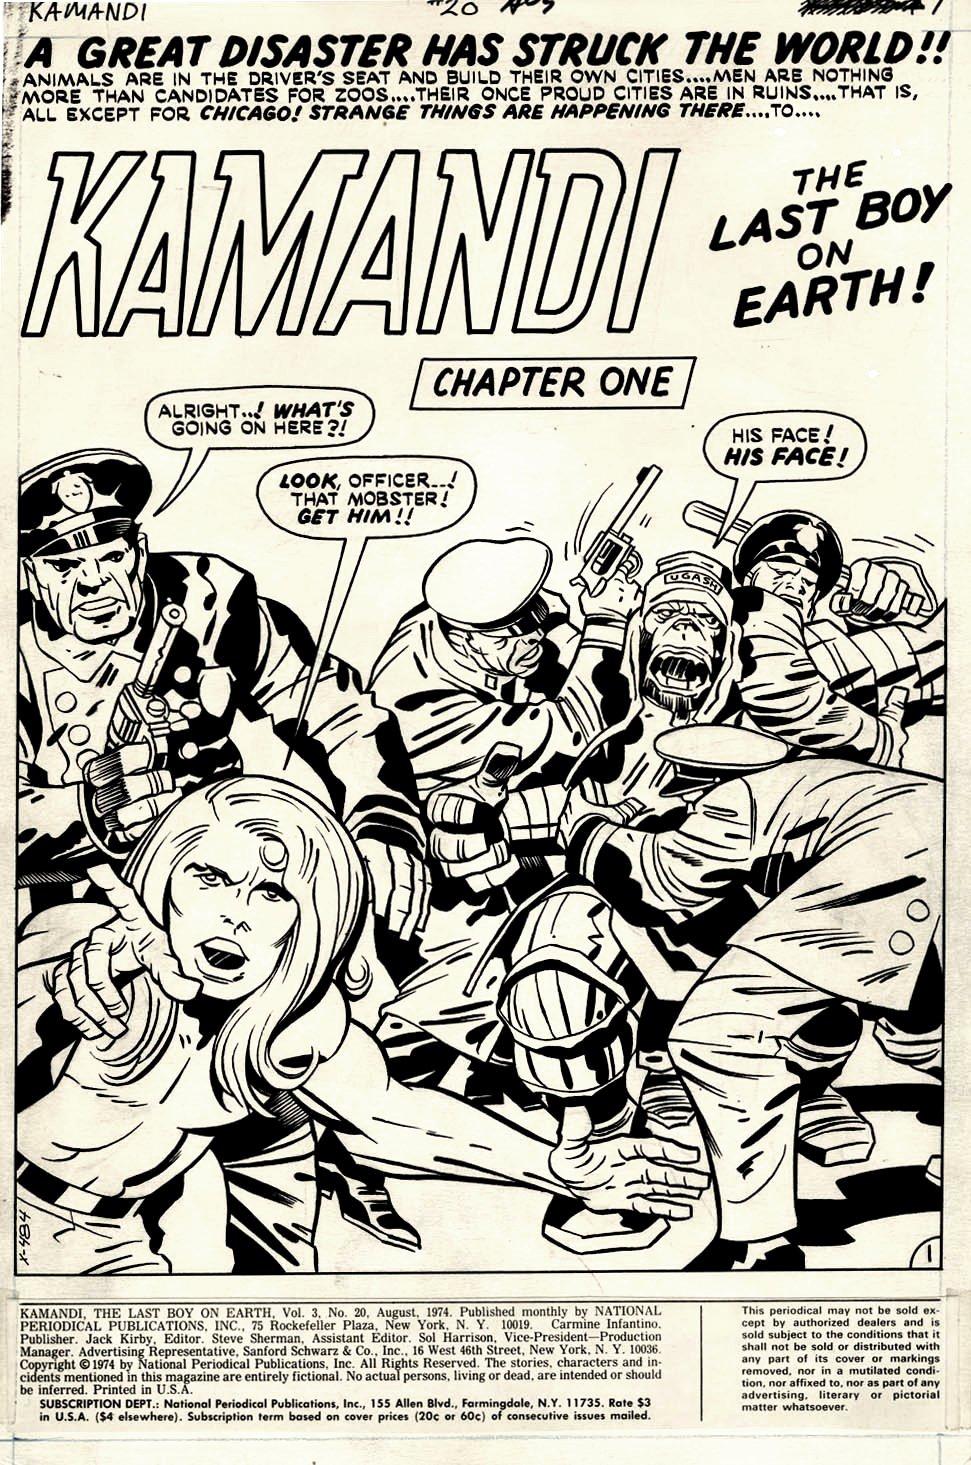 Kamandi #20 p 1 SPLASH (Kamandi, Cops, & Gorilla-Man!) 1974